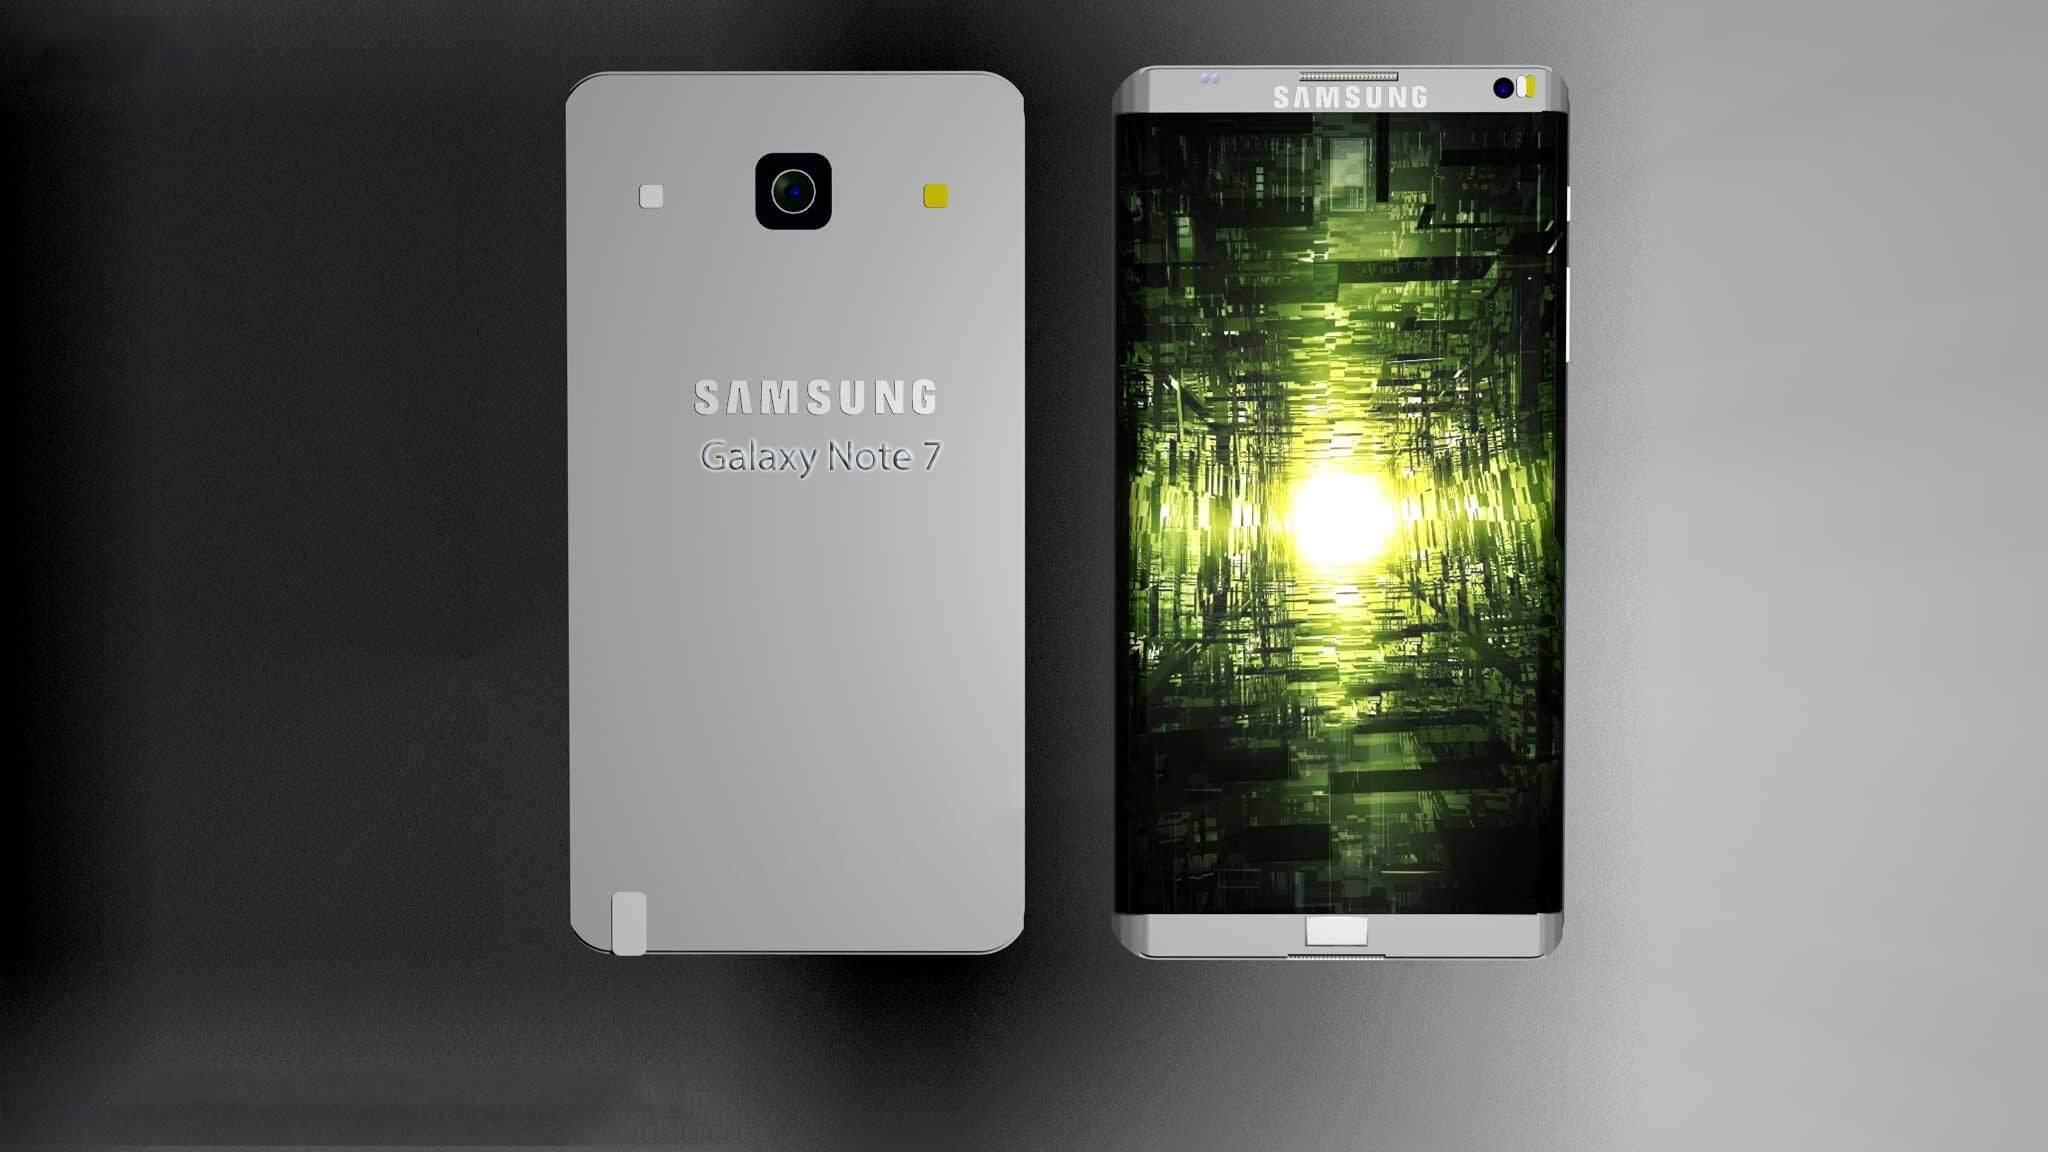 smt GalaxyNote capa - Nova linha Galaxy Note pode ter menos versões disponíveis